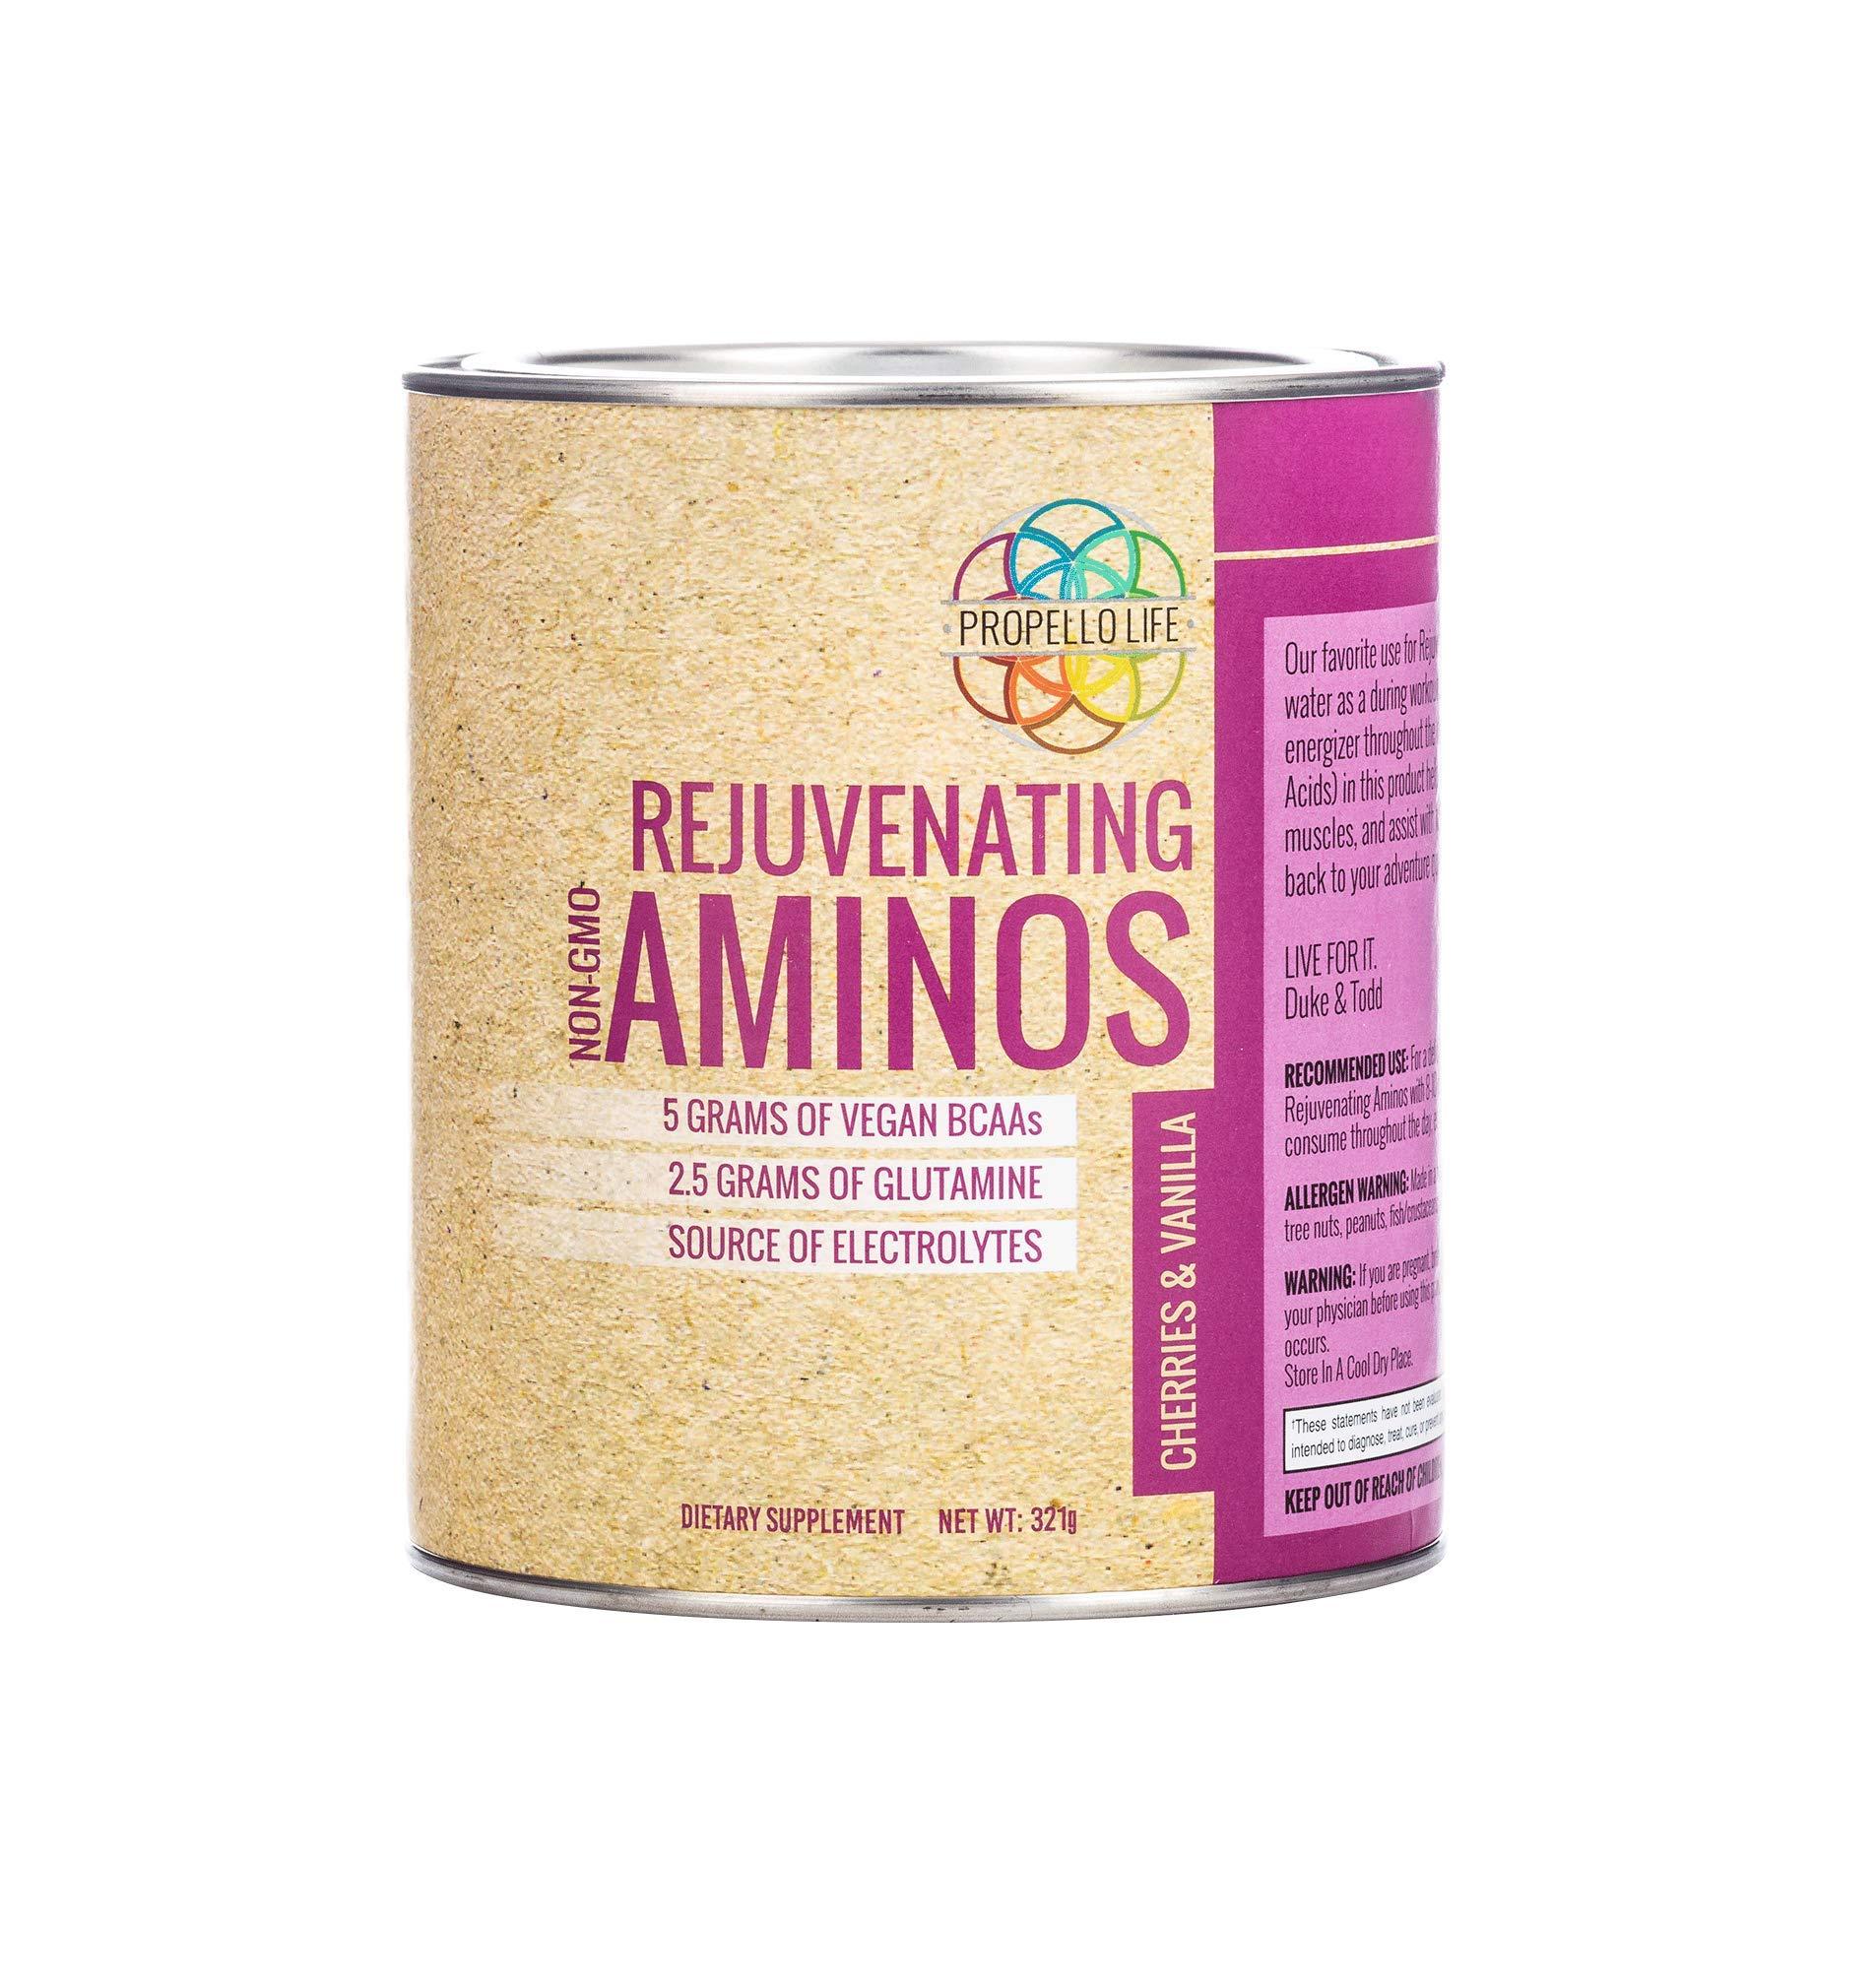 Propello Life Rejuvenating Aminos, Cherries and Vanilla, 321 Grams